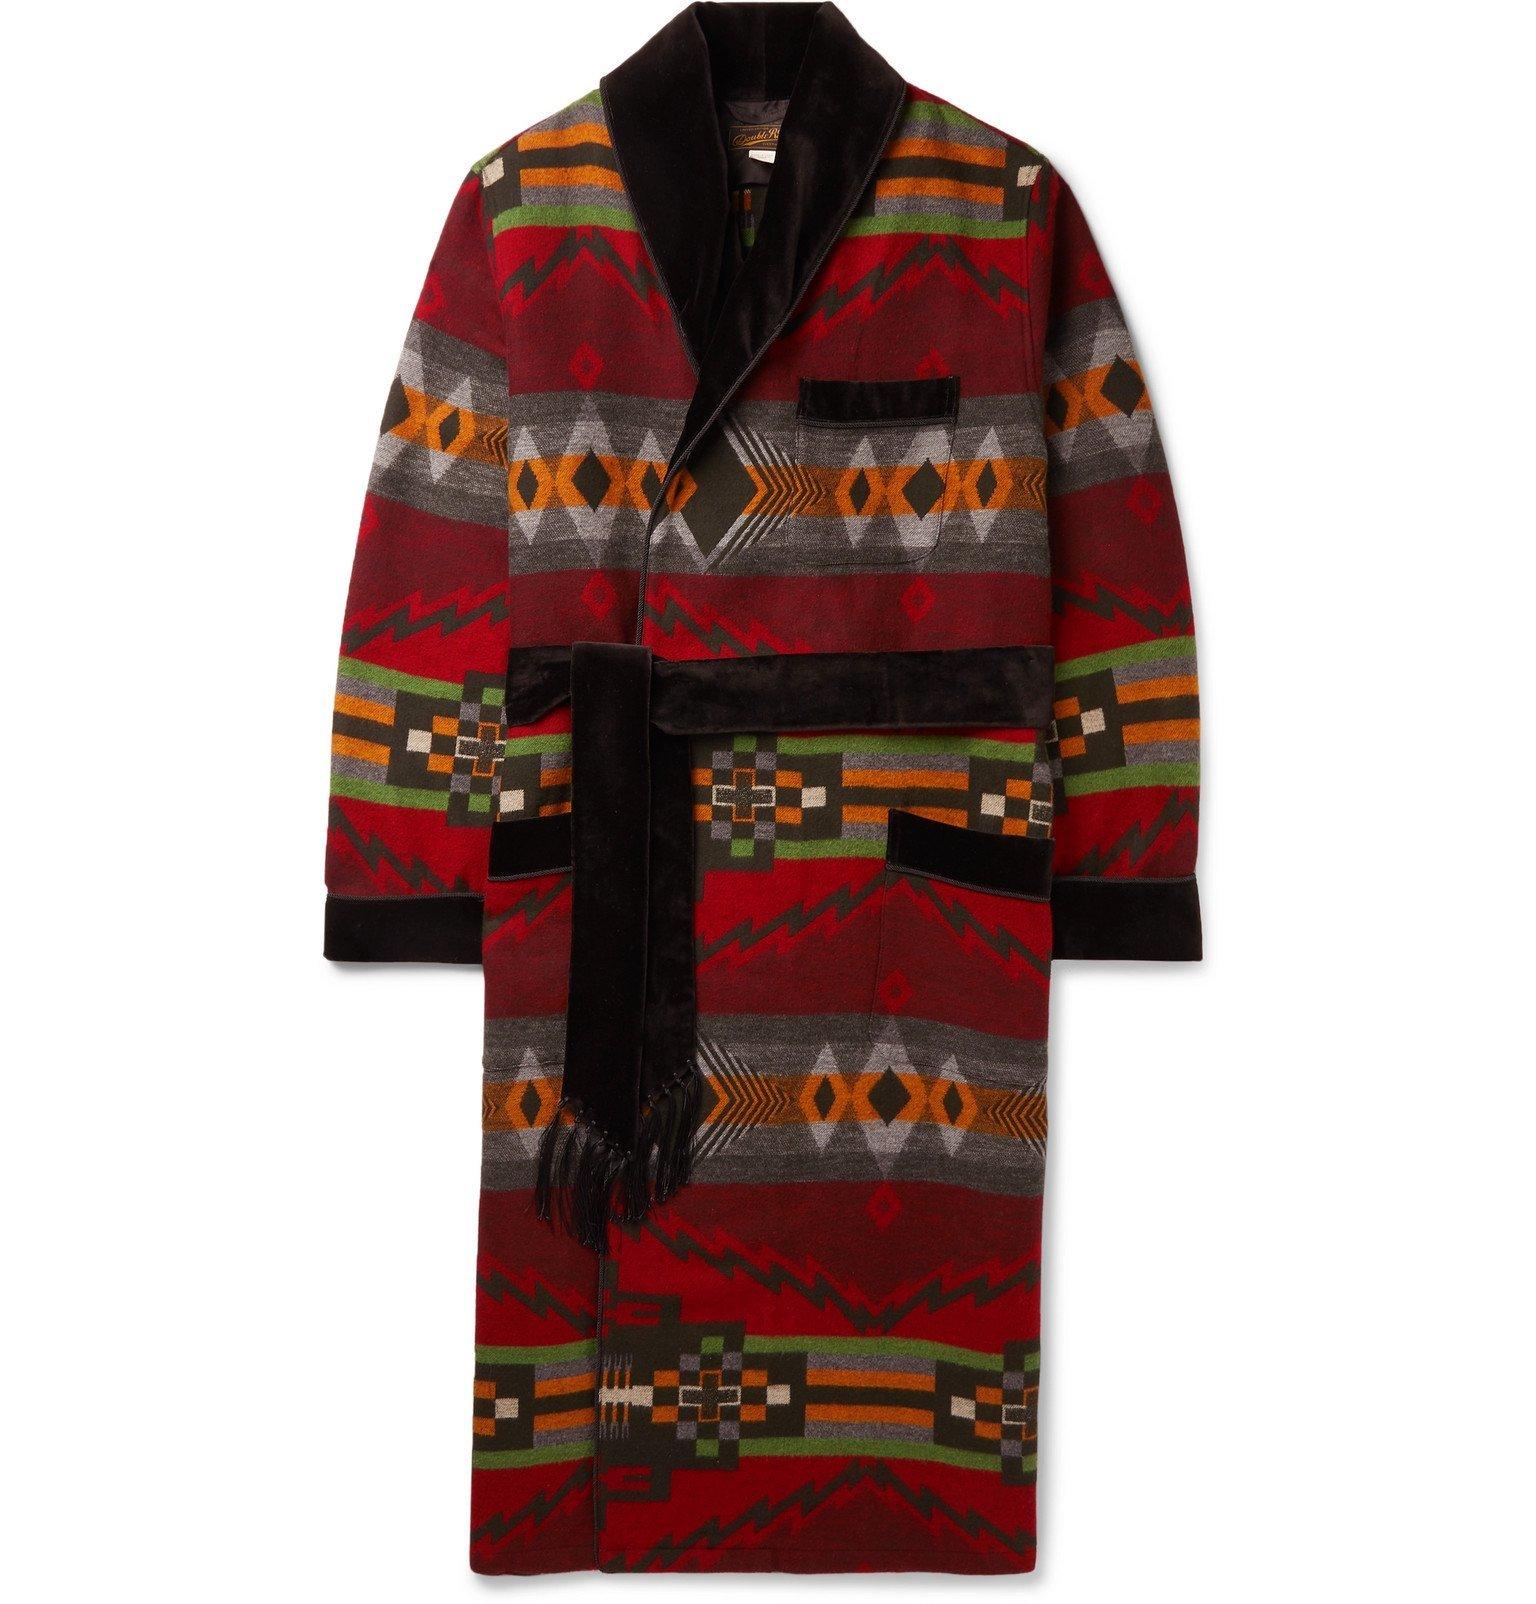 RRL - Velvet-Trimmed Cotton and Wool-Blend Jacquard Robe - Red